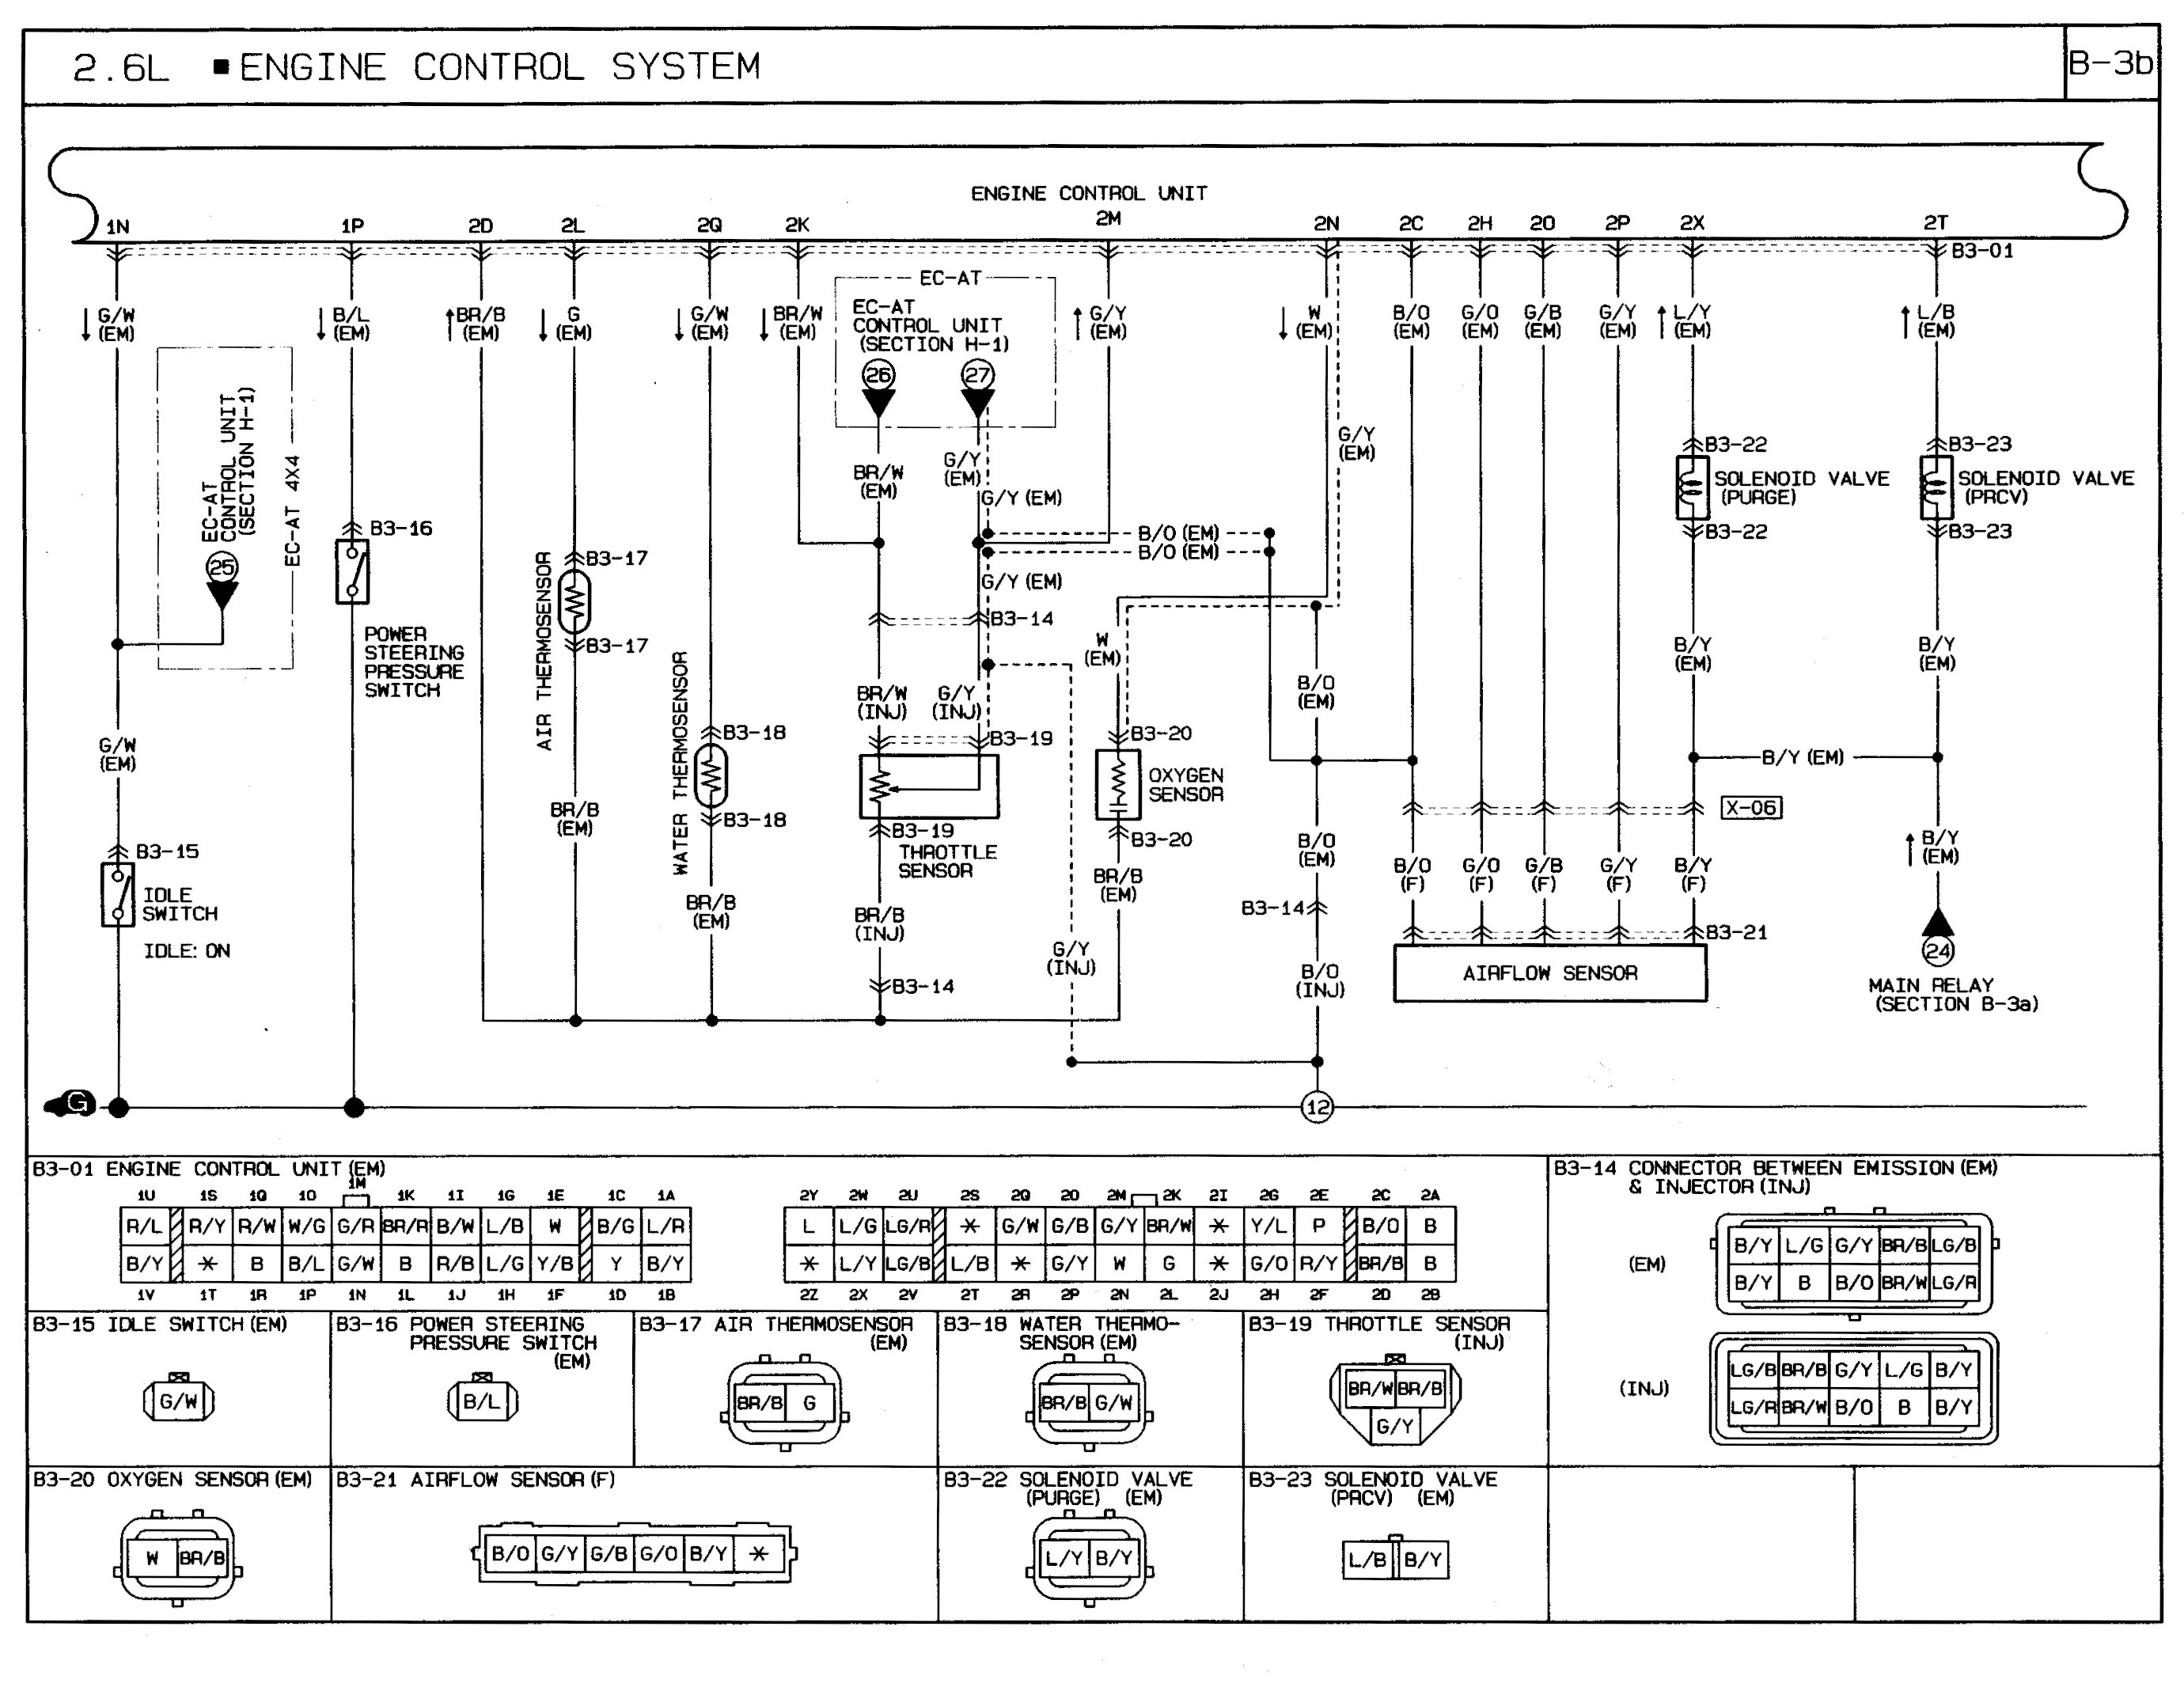 wiring diagram 1999 mazda miata kc 7608  mazda wiring diagram schematic wiring  mazda wiring diagram schematic wiring